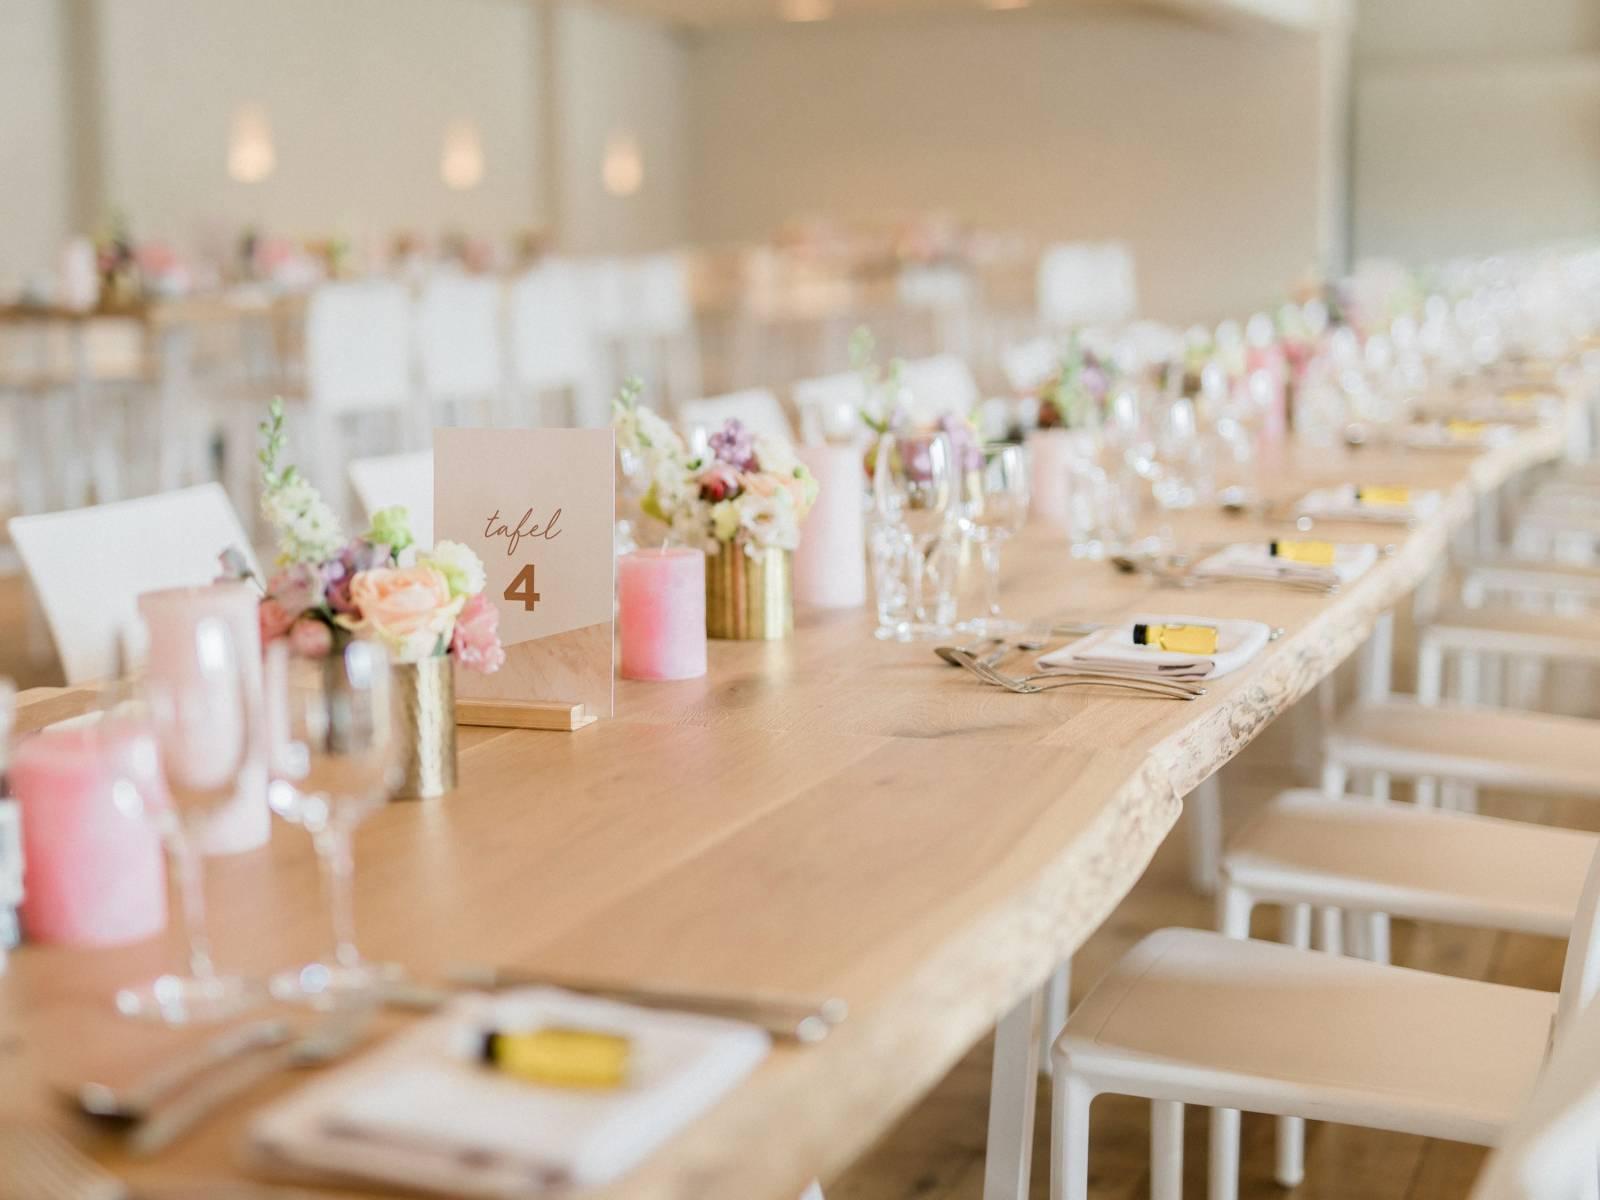 Maison Julie - Bruidsboeket - Bloemen huwelijk trouw bruiloft - Kelly & Jonas - Long Story Short - House of Weddings - 22